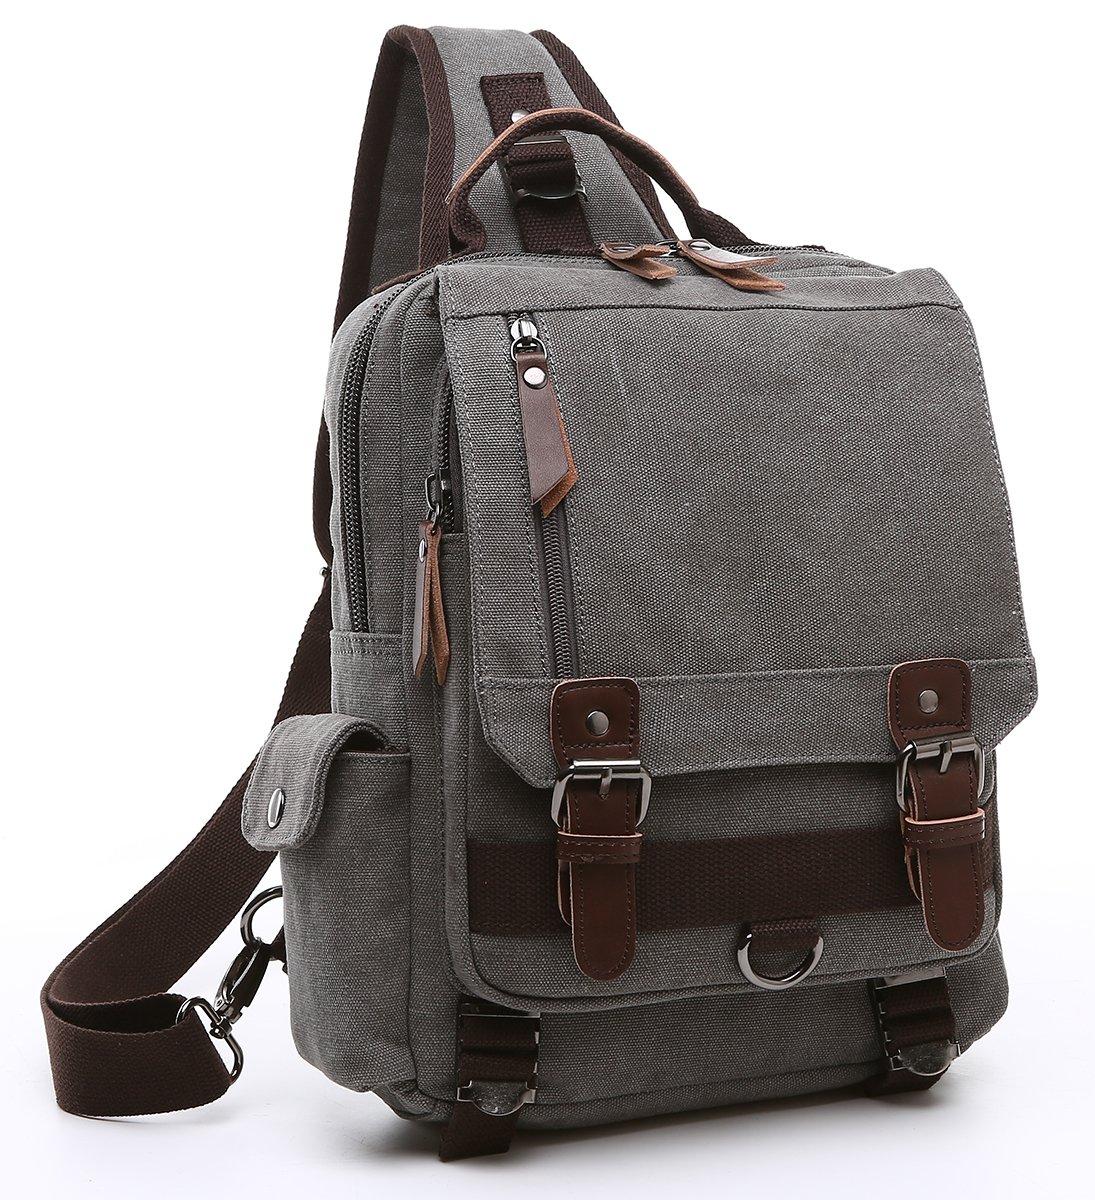 Collsants Canvas Sling Backpack Crossbody Messenger Bag Travel Shoulder Daypack (Gray)